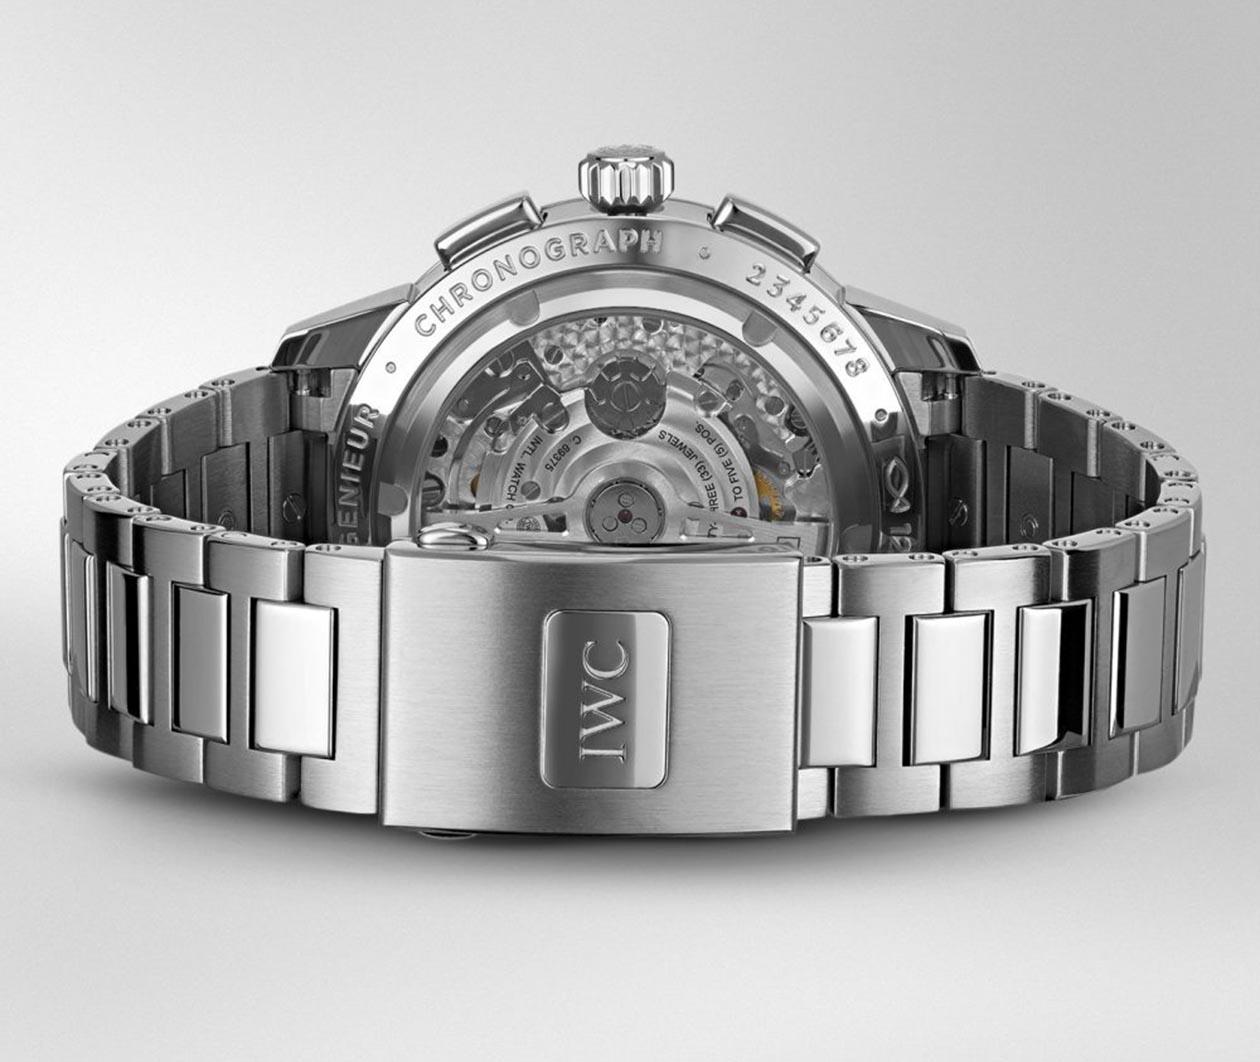 IWC Ingenieur Chronograph IW380802 Carousel 5 FINAL